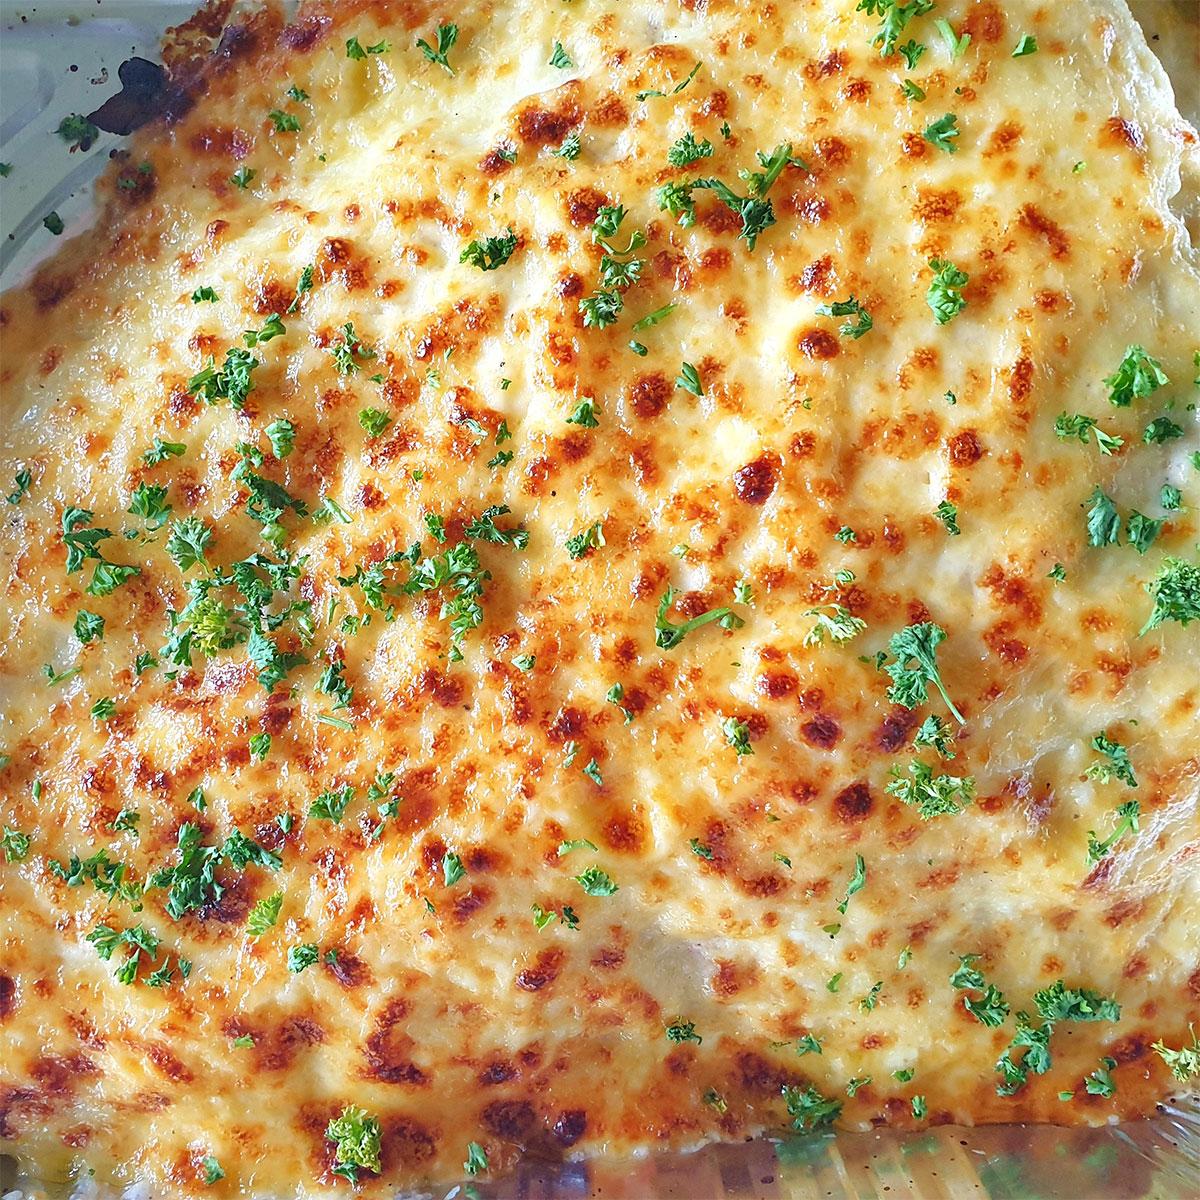 Baked Salmon w/ cheesy mayo garlic sauce